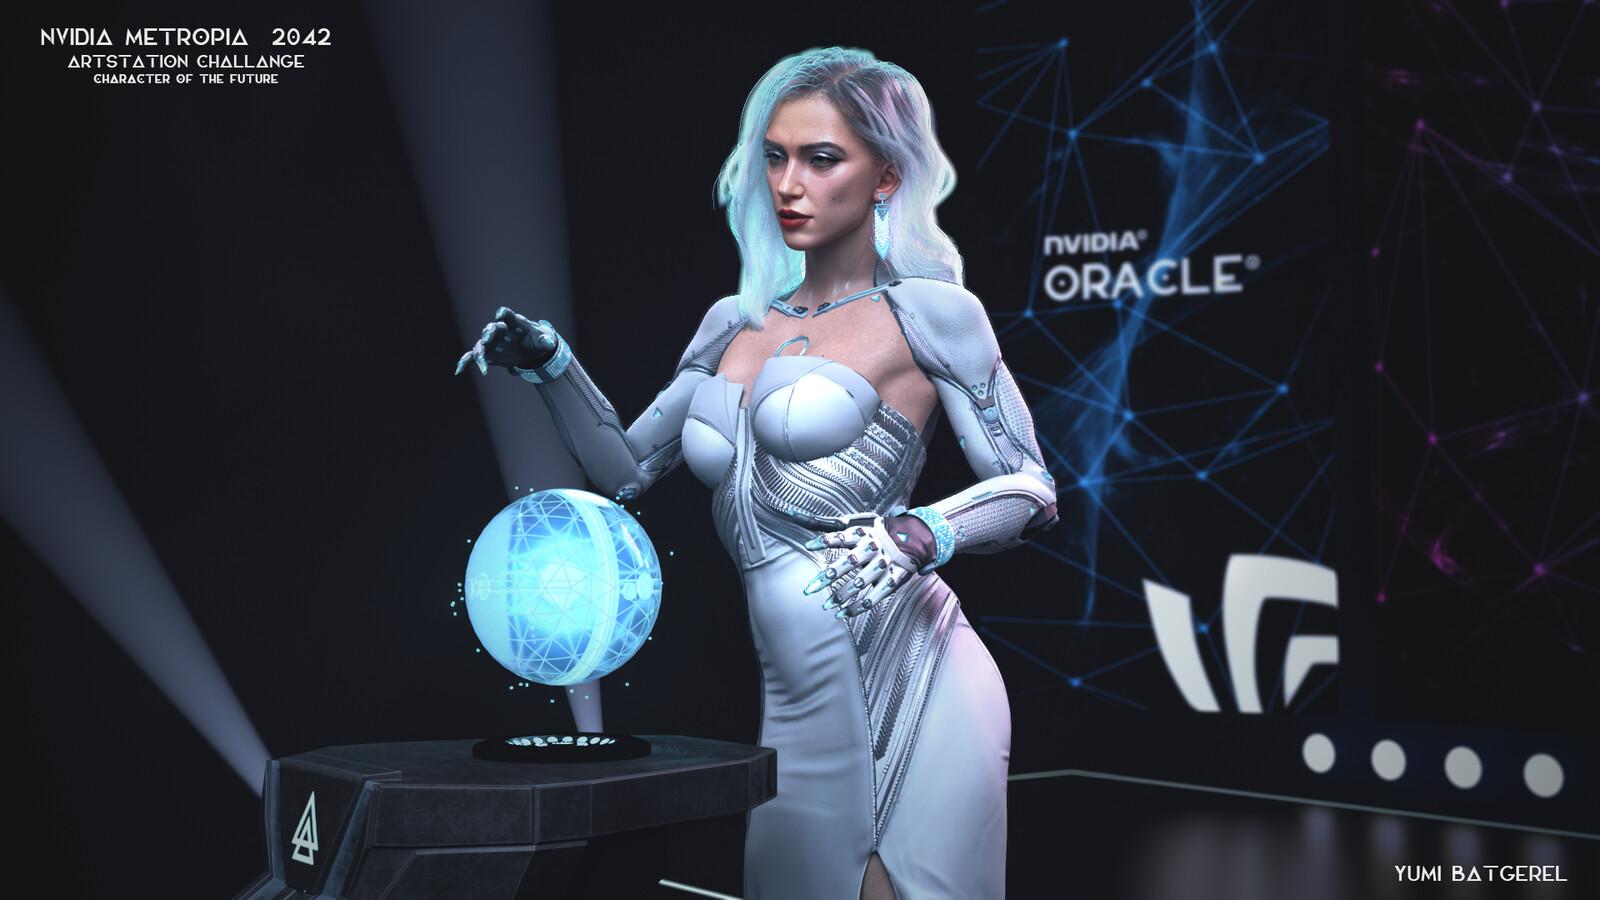 Artstation Challenge, Nvidia - Metropia 2042